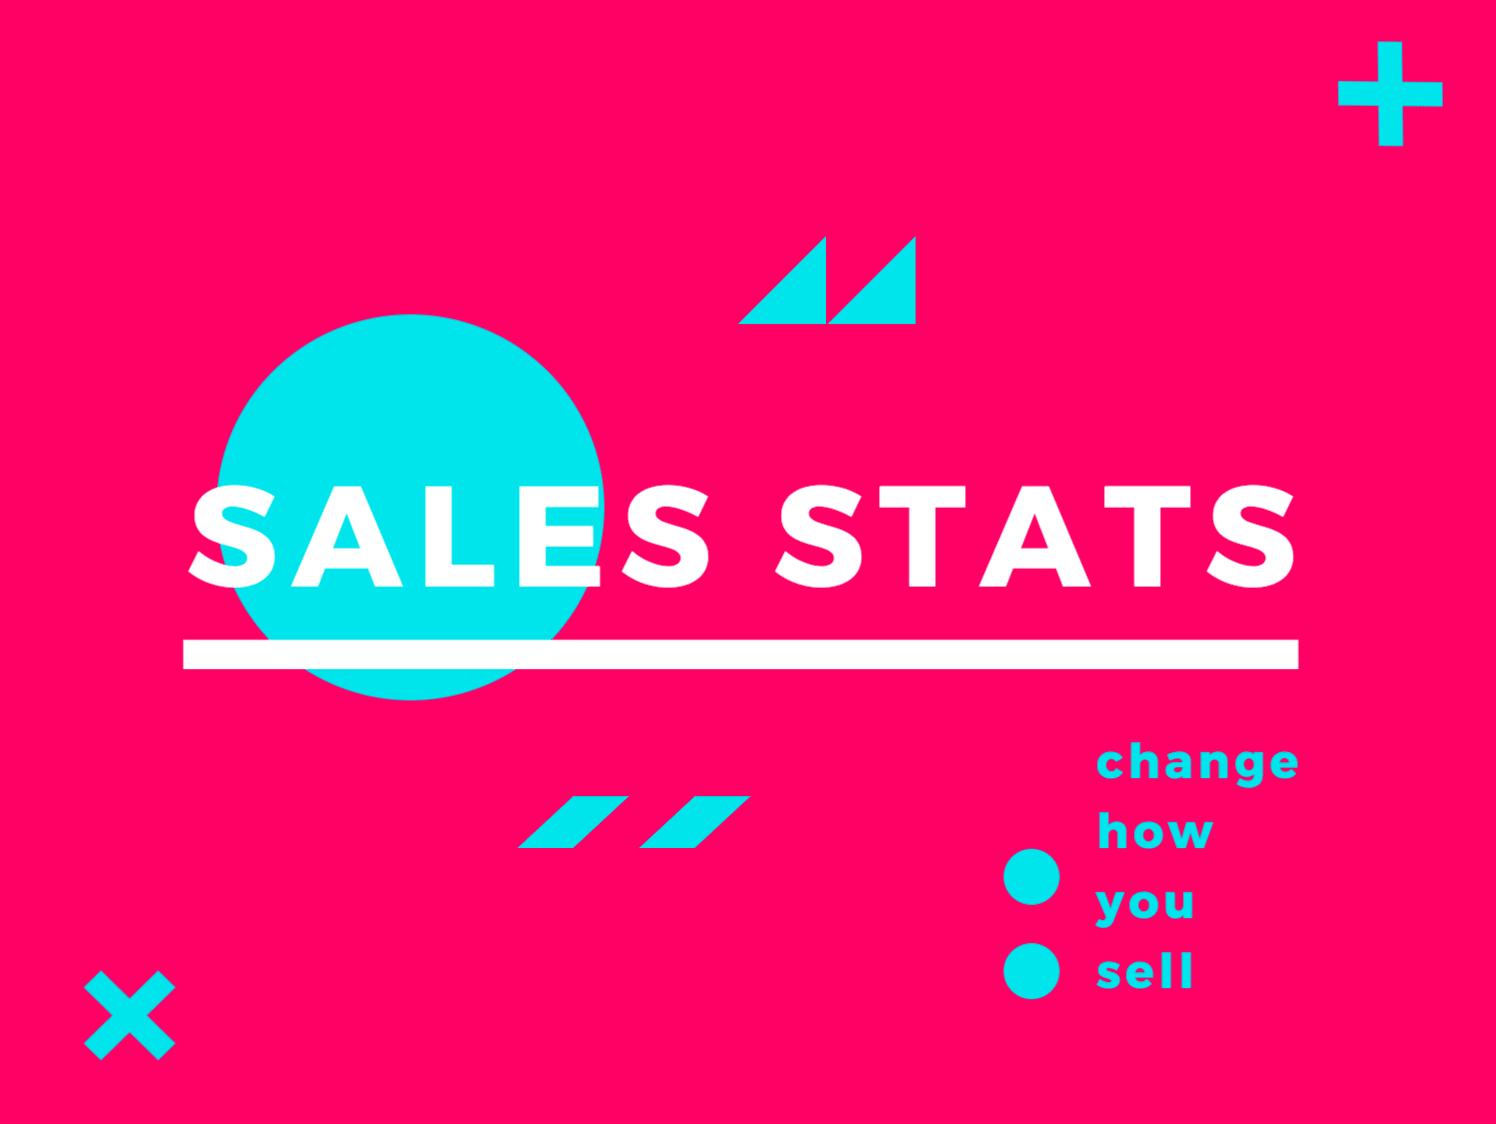 Sales Presentation Design Your Sales Pitch Deck Free  Canva